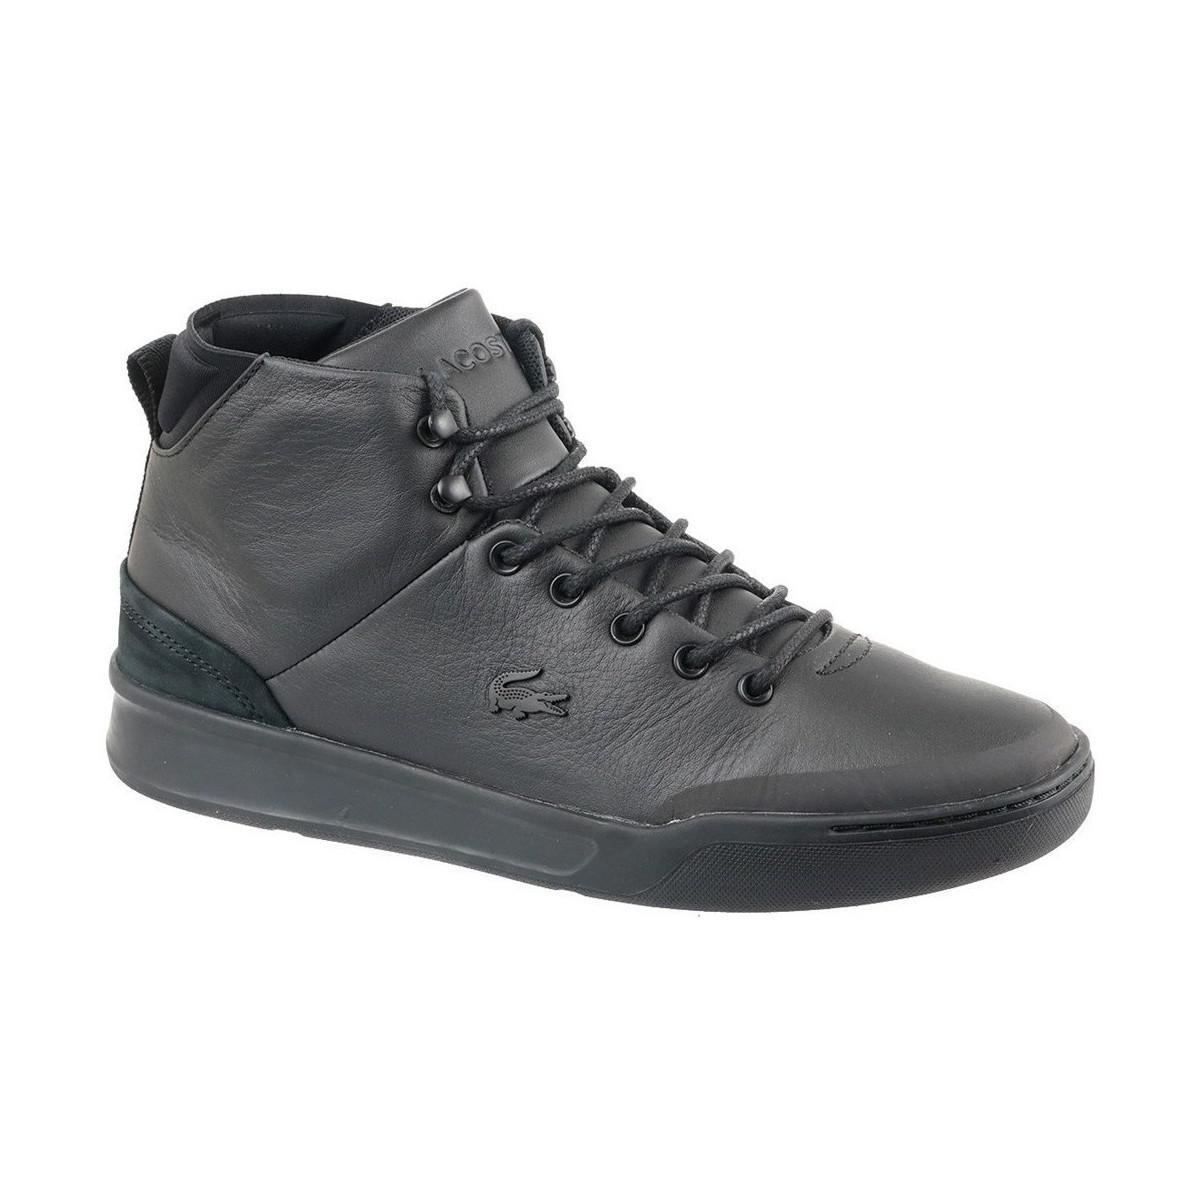 73ca4704e Lacoste Explorateur Classic Men s Shoes (high-top Trainers) In Black ...